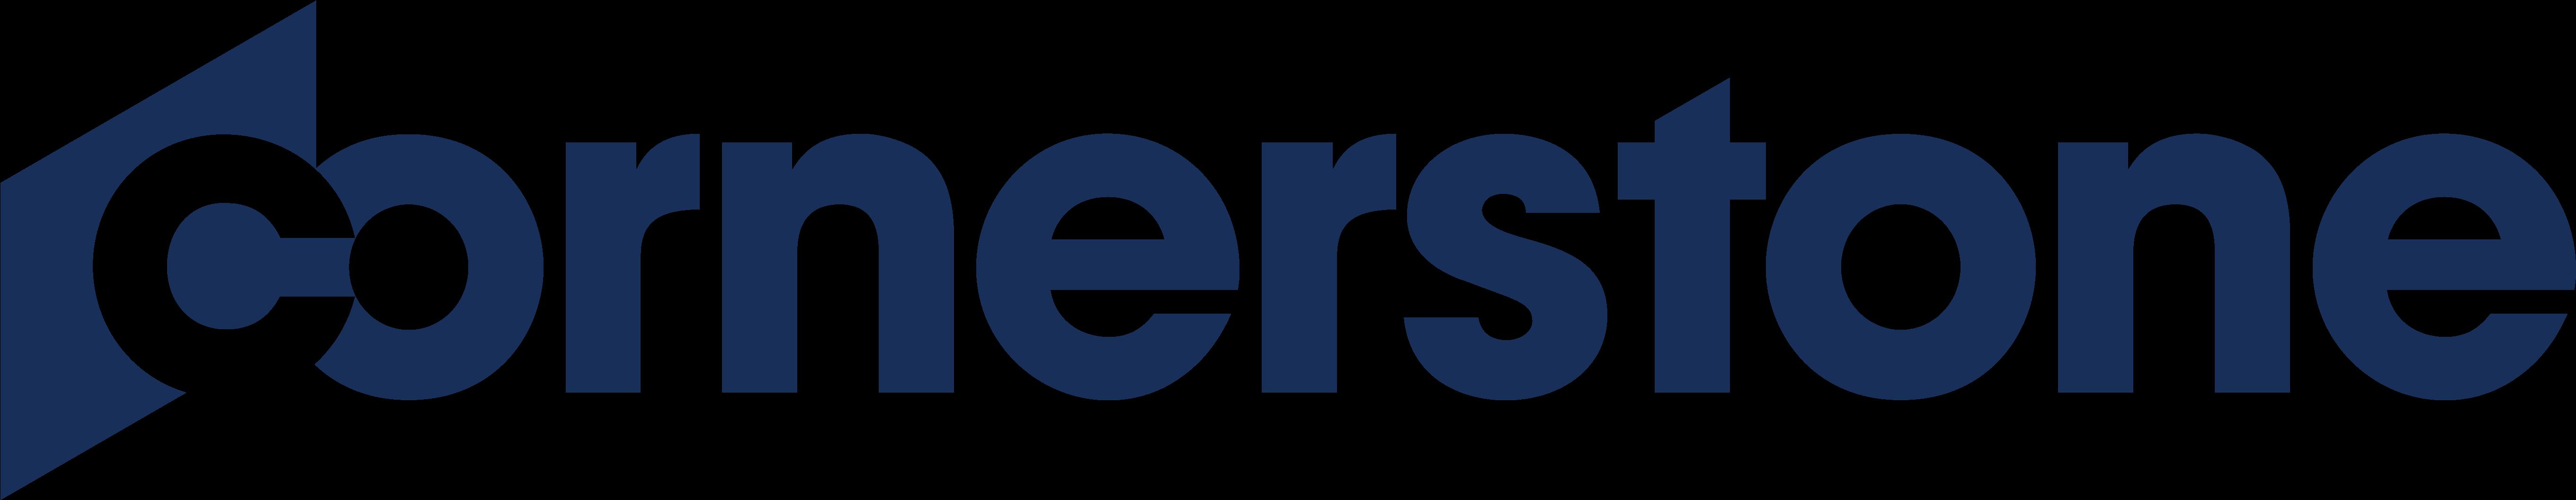 Cornerstone Talent Management logo